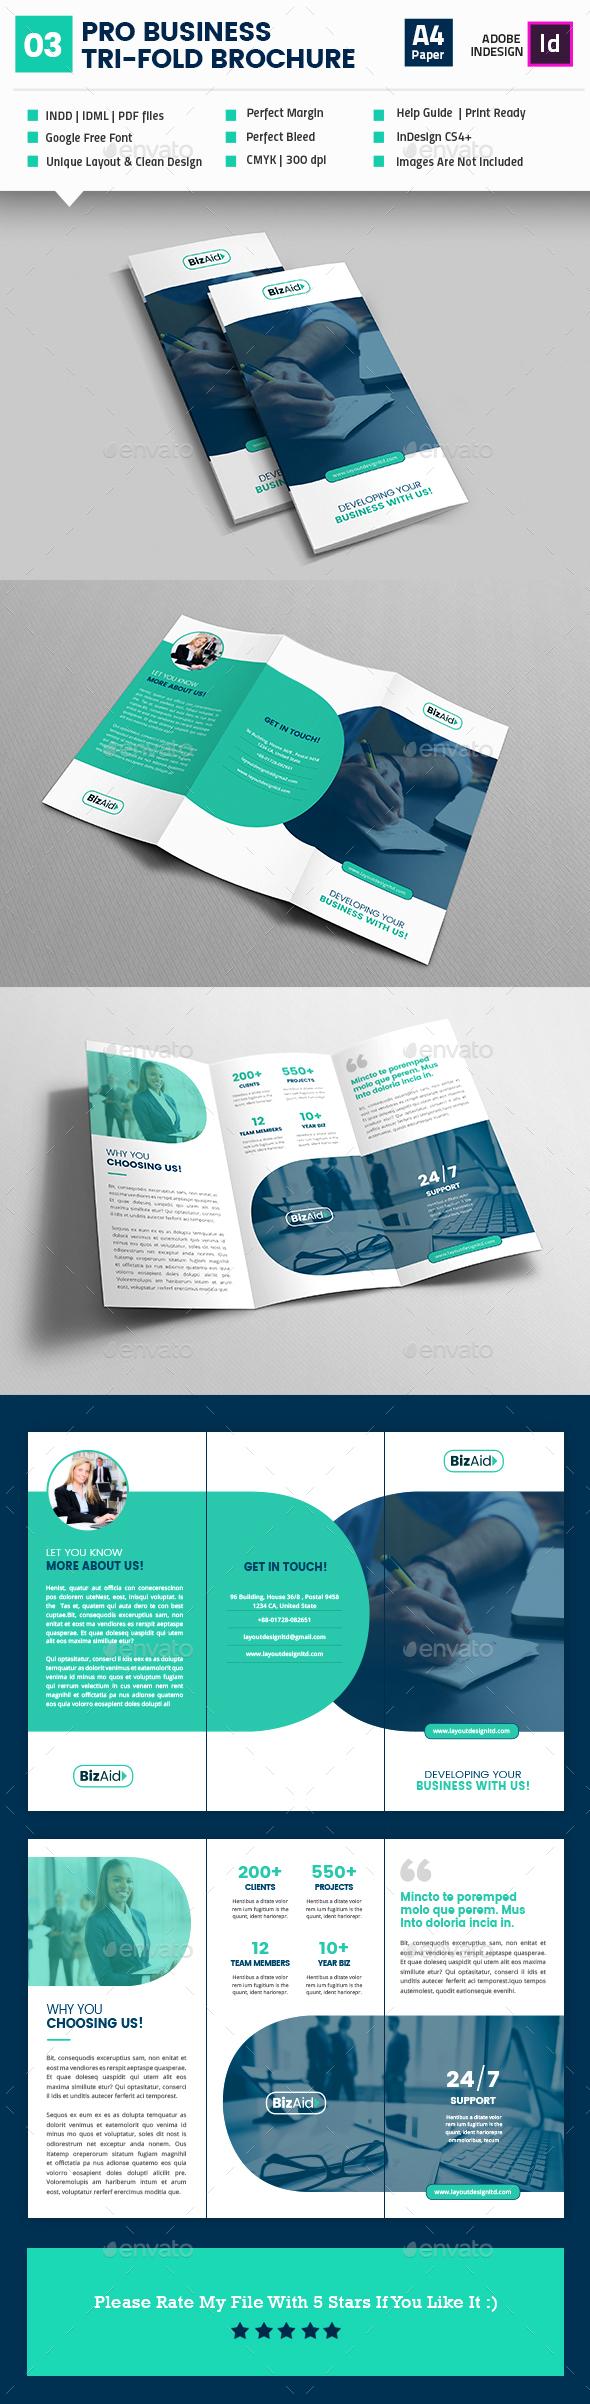 indesign tri fold brochure template